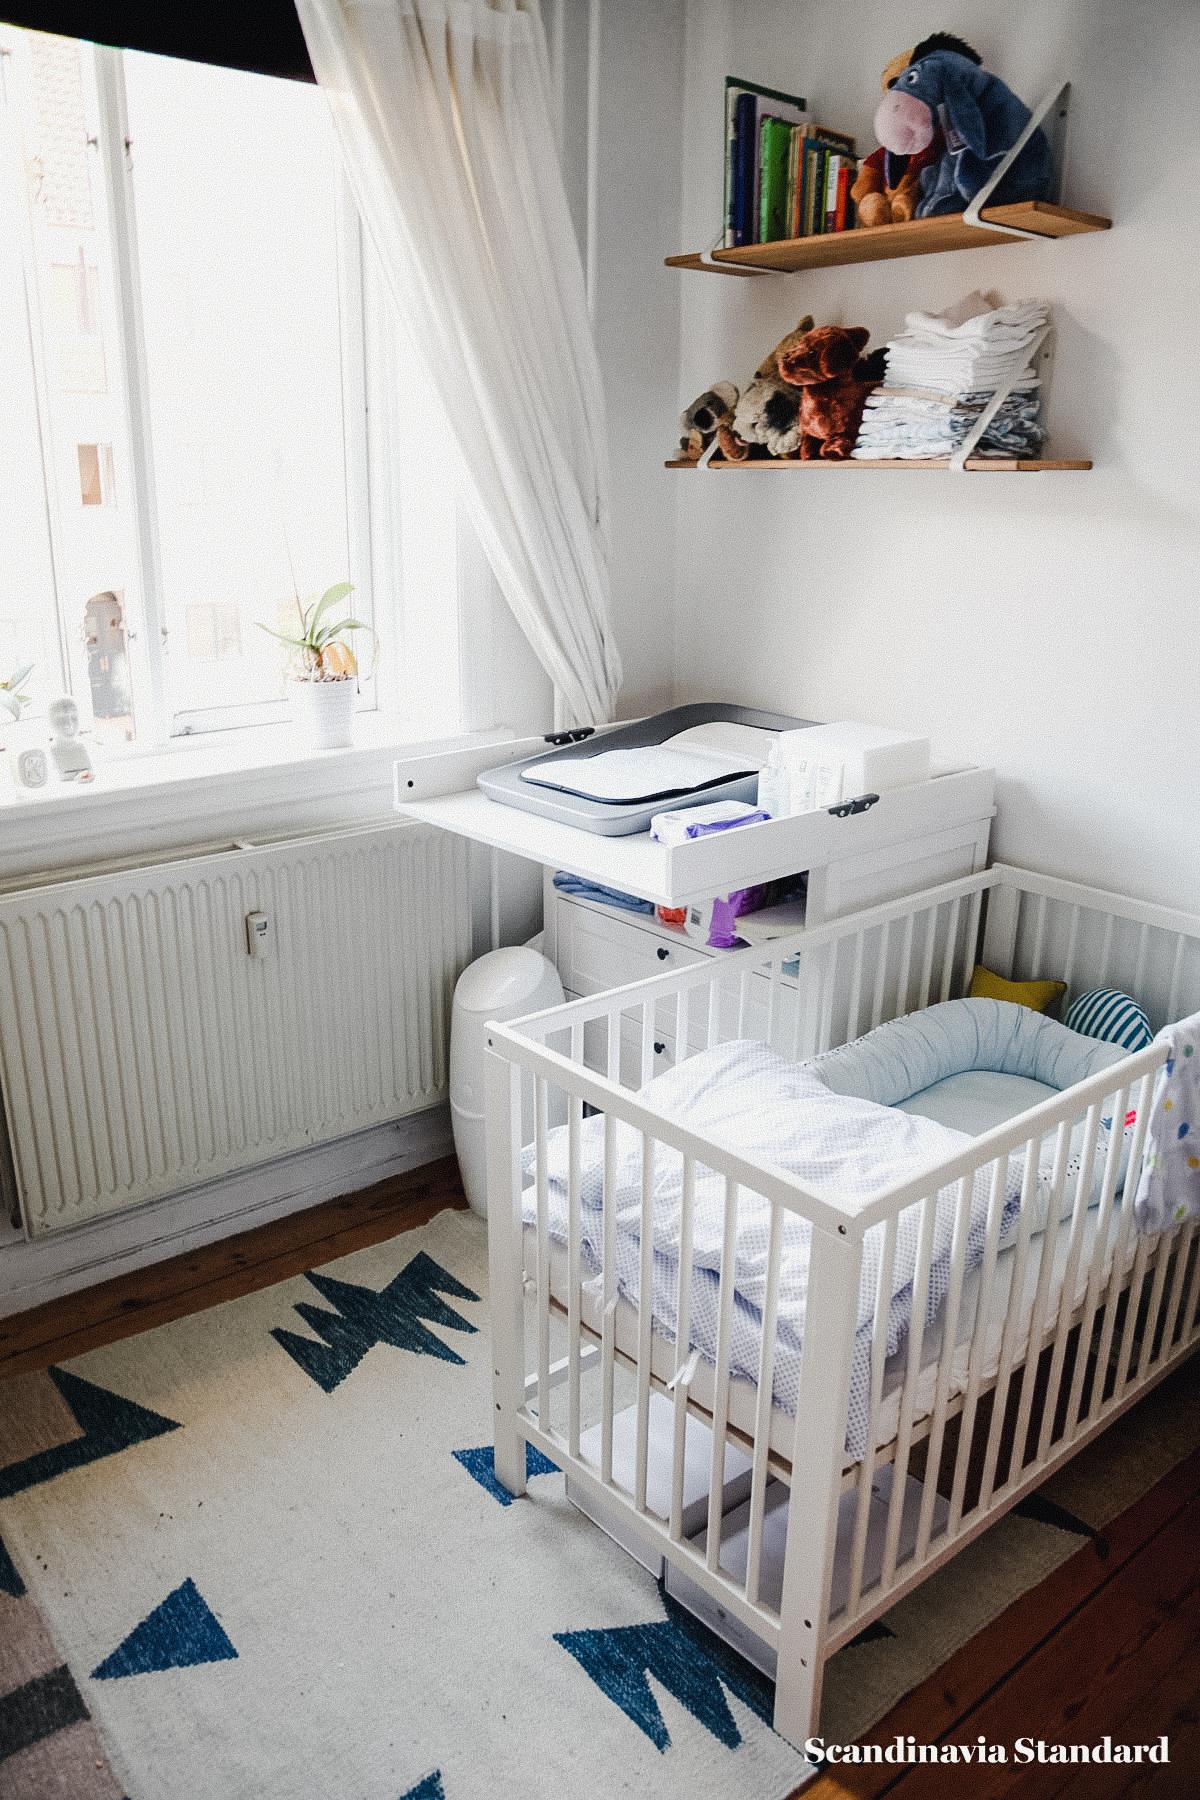 the-white-room-rebeccas-nordvest-apartment-copenhagen-interiors-scandianvia-standard-8857